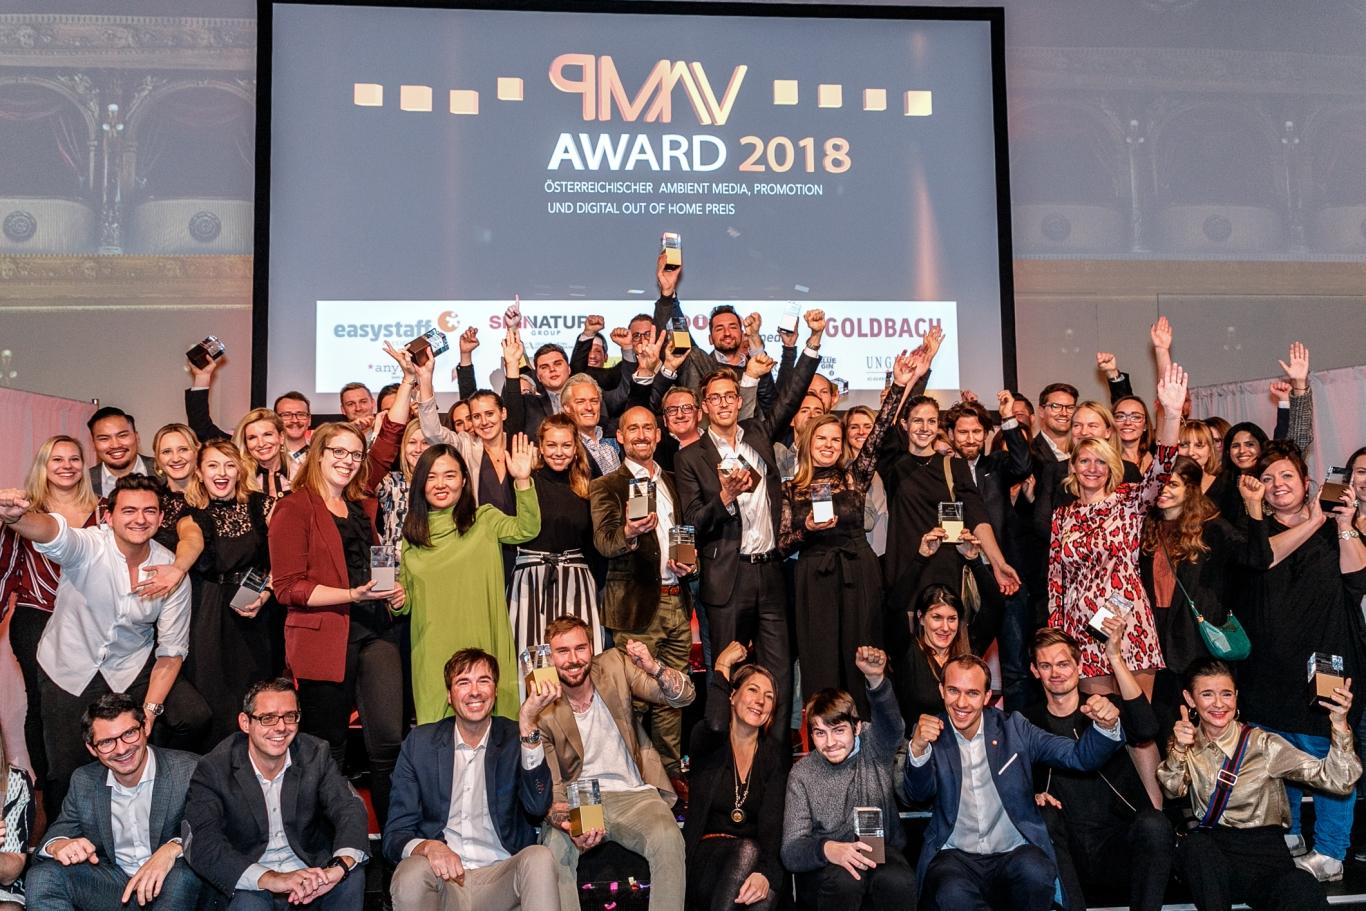 Vamp Award 2018